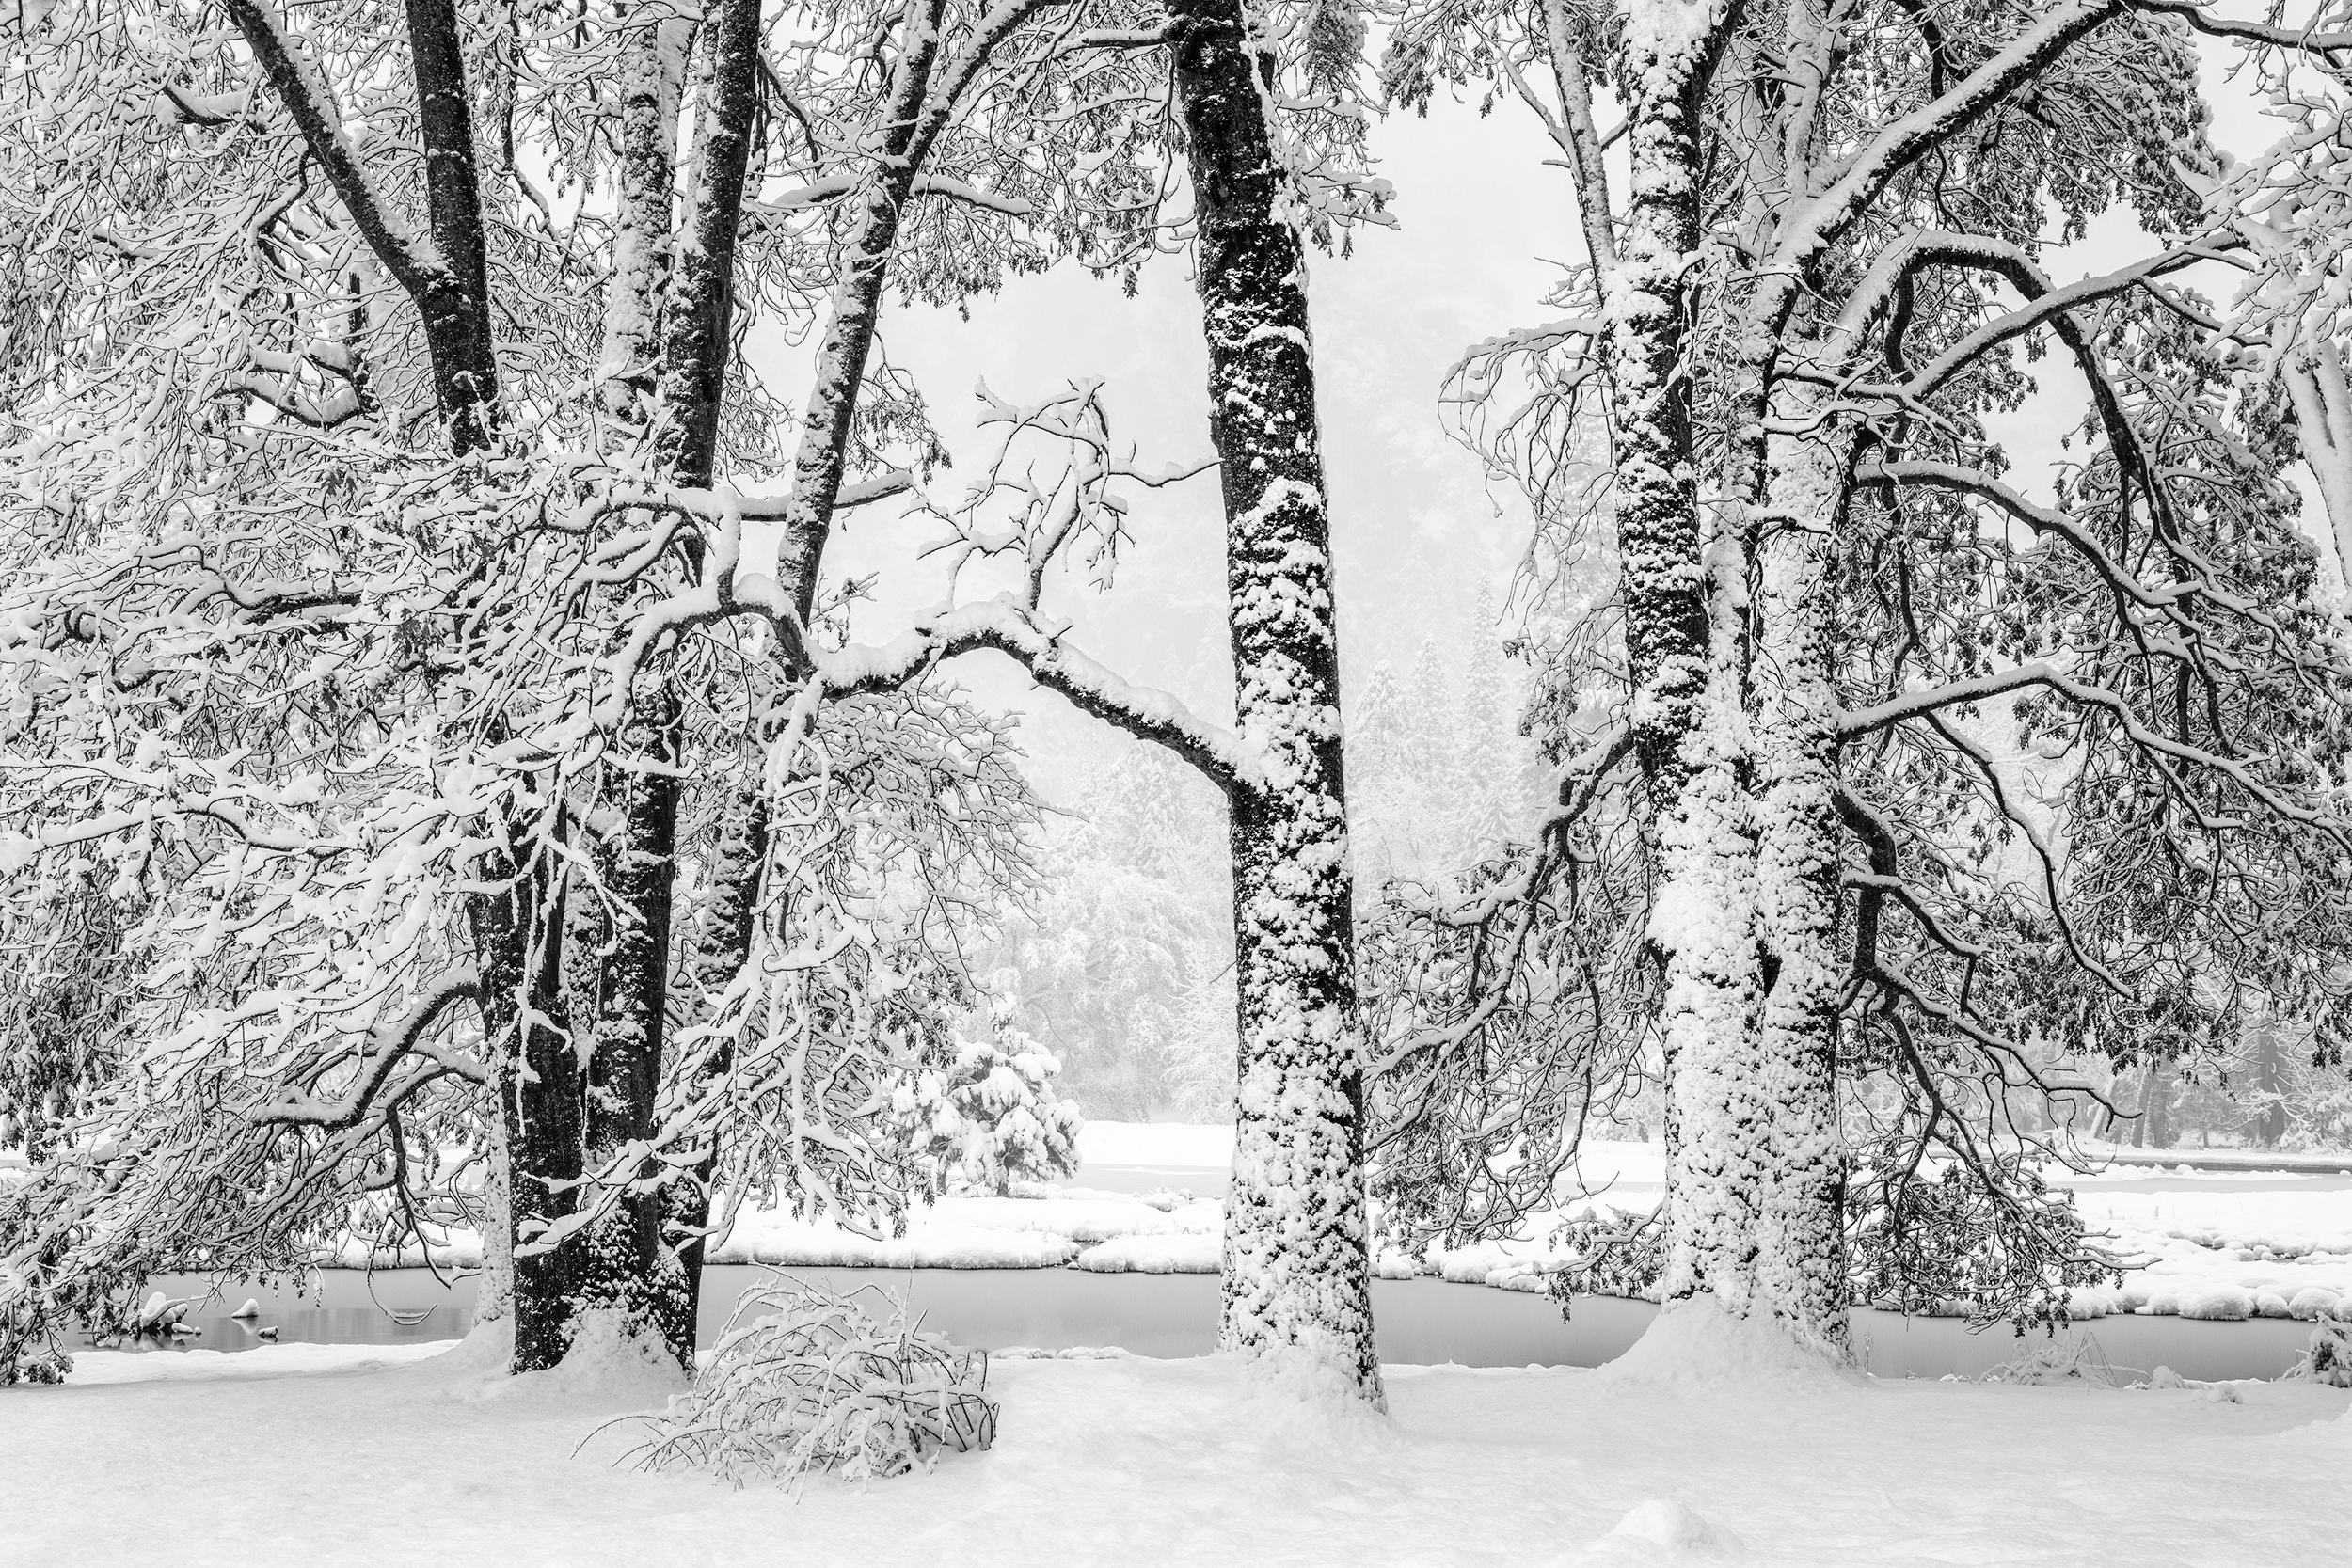 Cook's Meadow Oaks in Snow (4784)